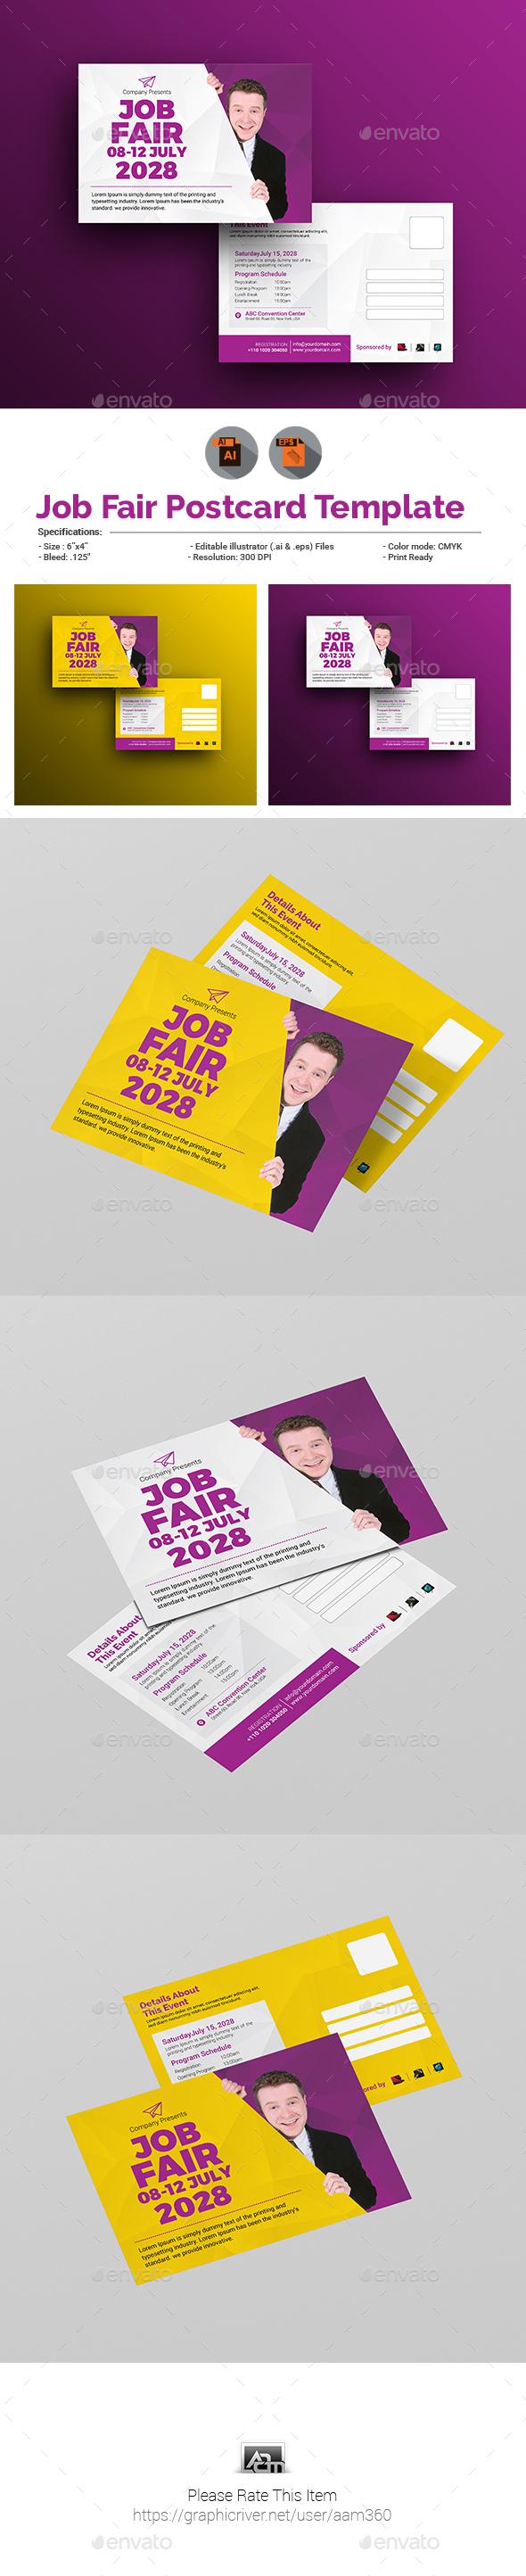 Job Fair Postcard Template - Cards & Invites Print Templates